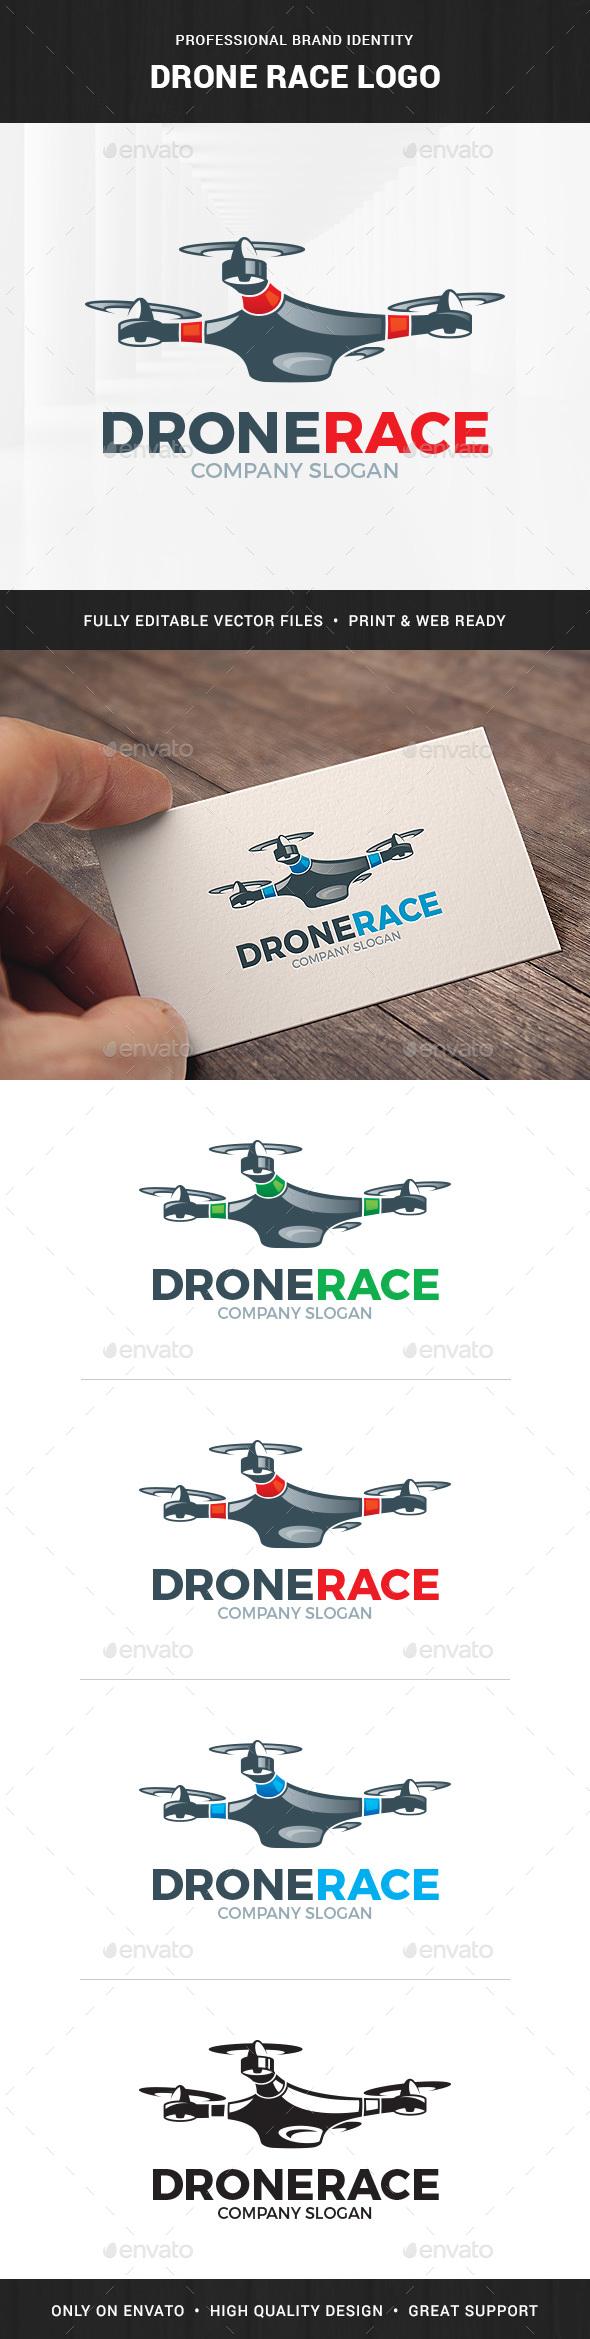 Drone Race Logo Template